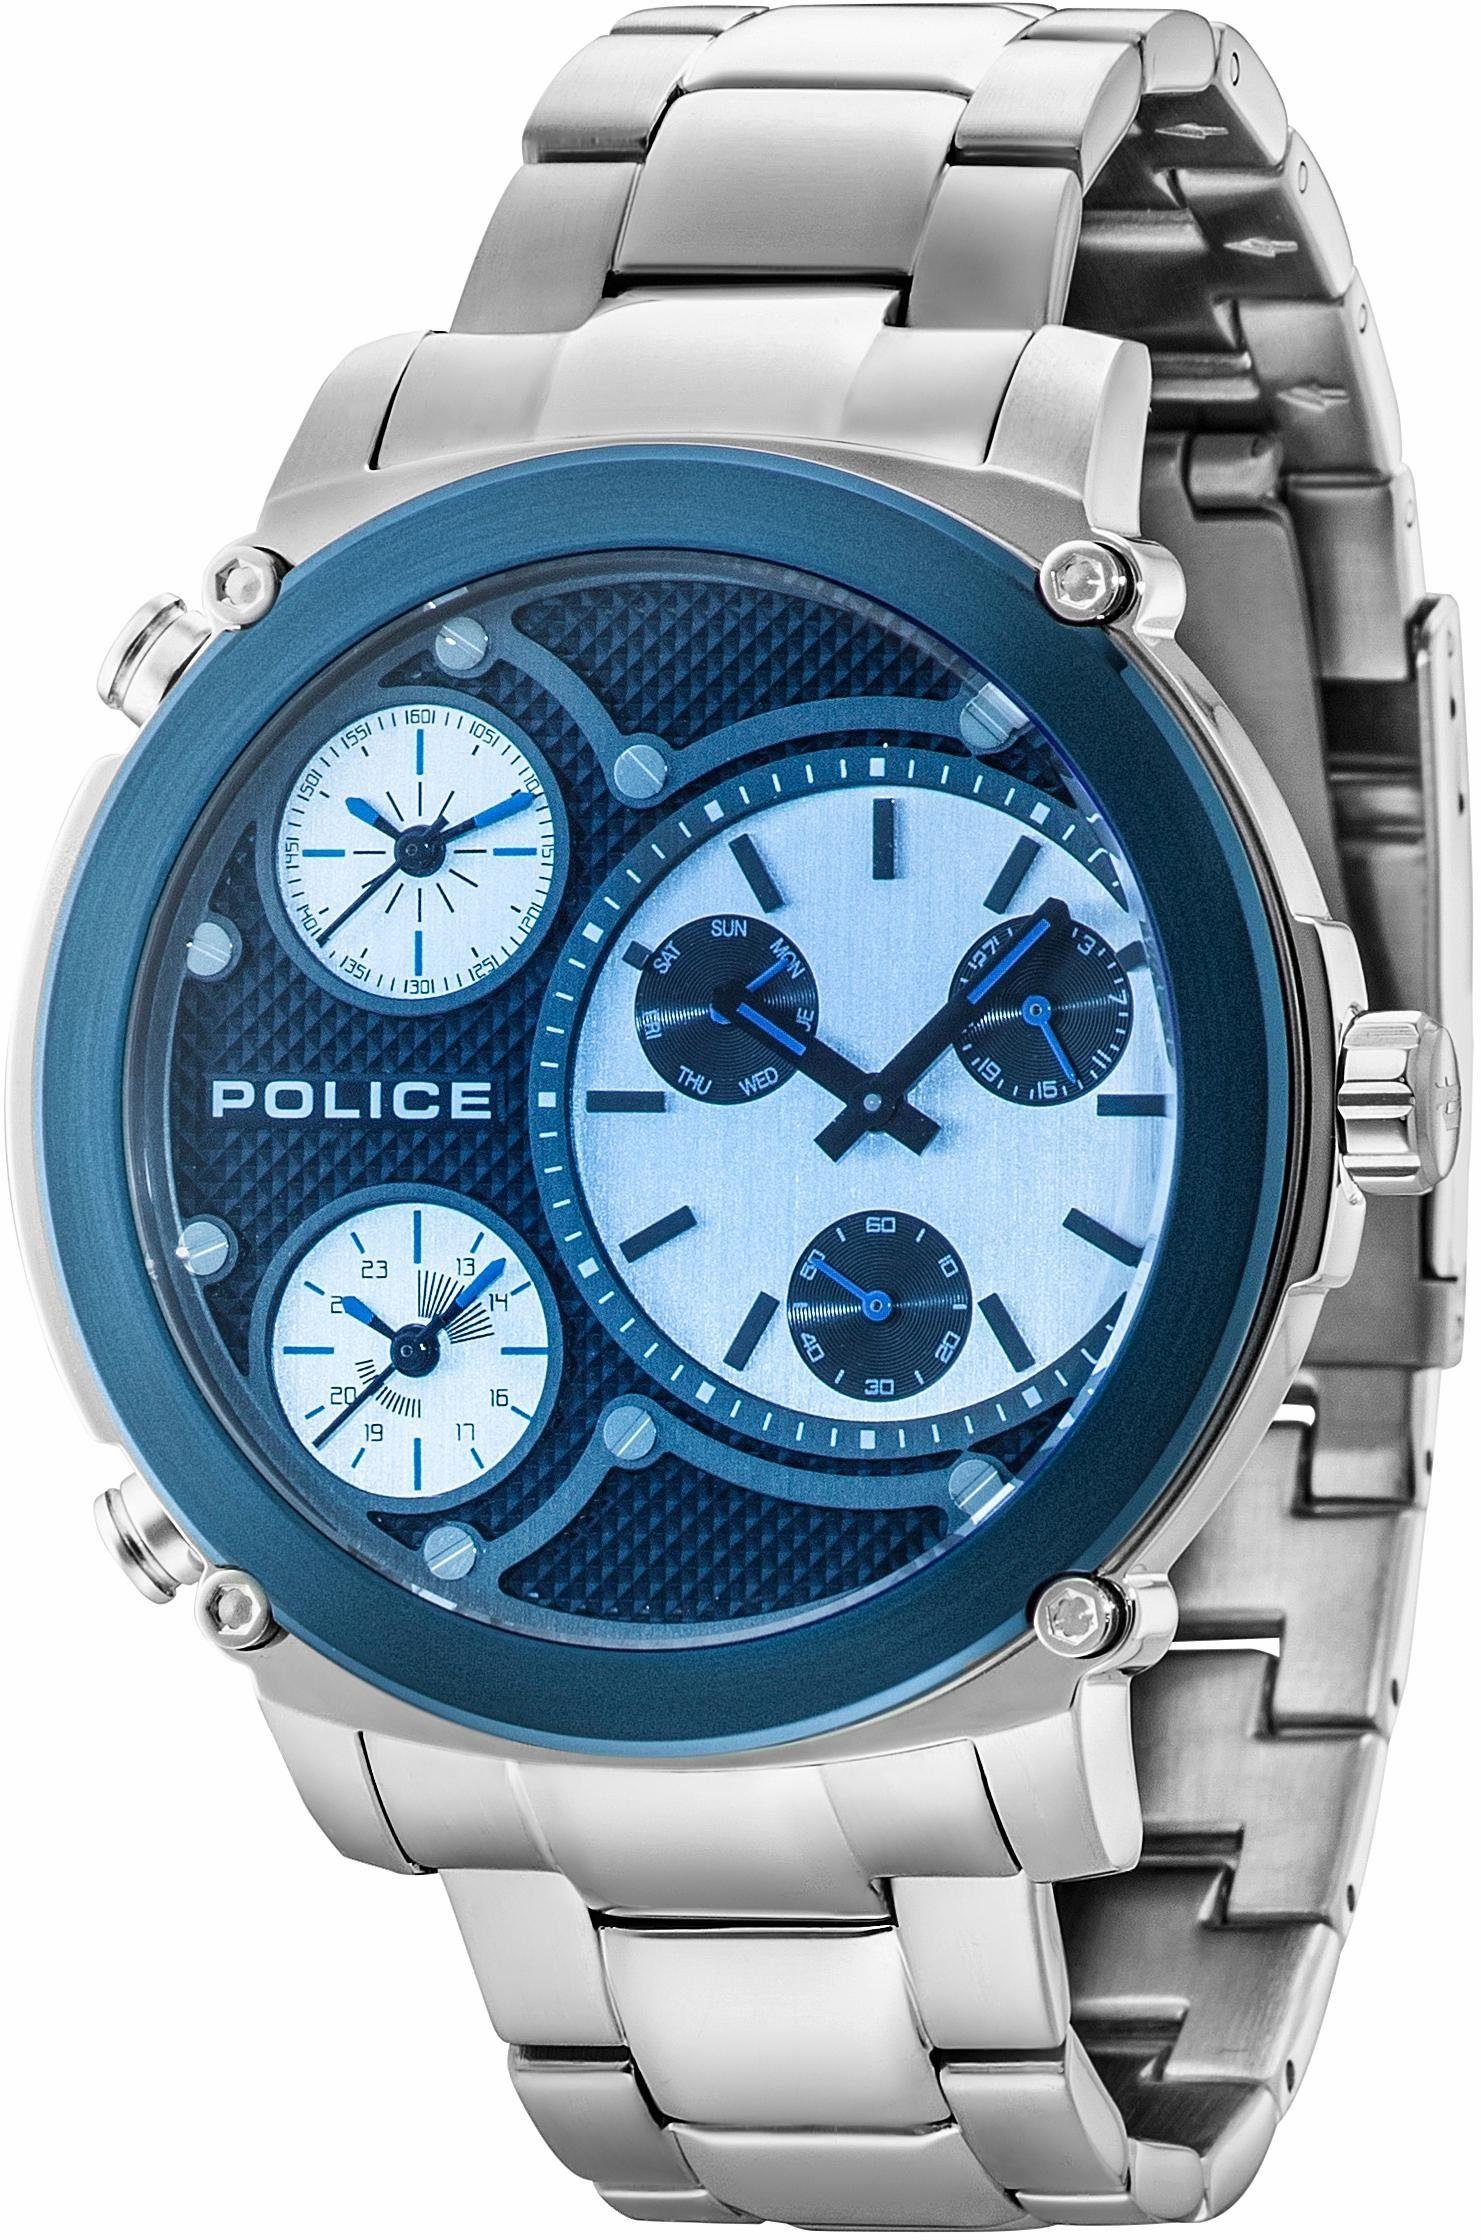 Police Chronograph »TITAN, PL14830JSTBL.02M«